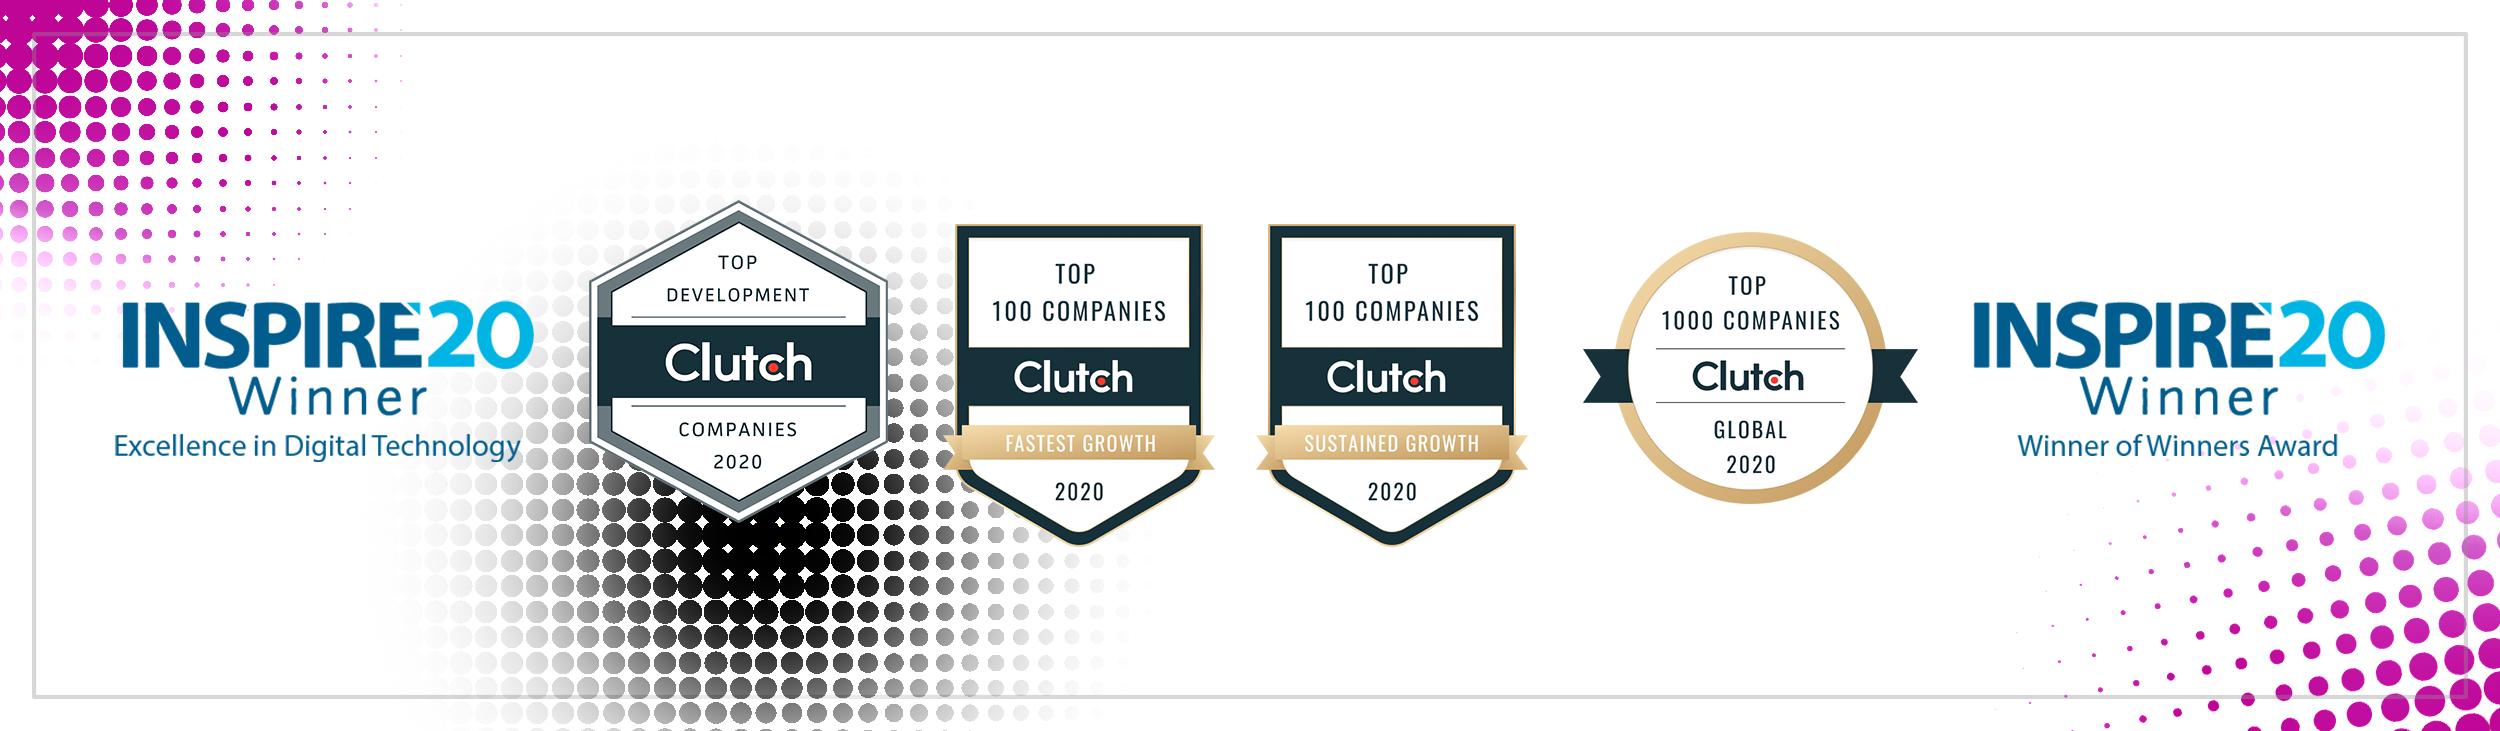 DCSL wins multiple prestigious awards in 2020